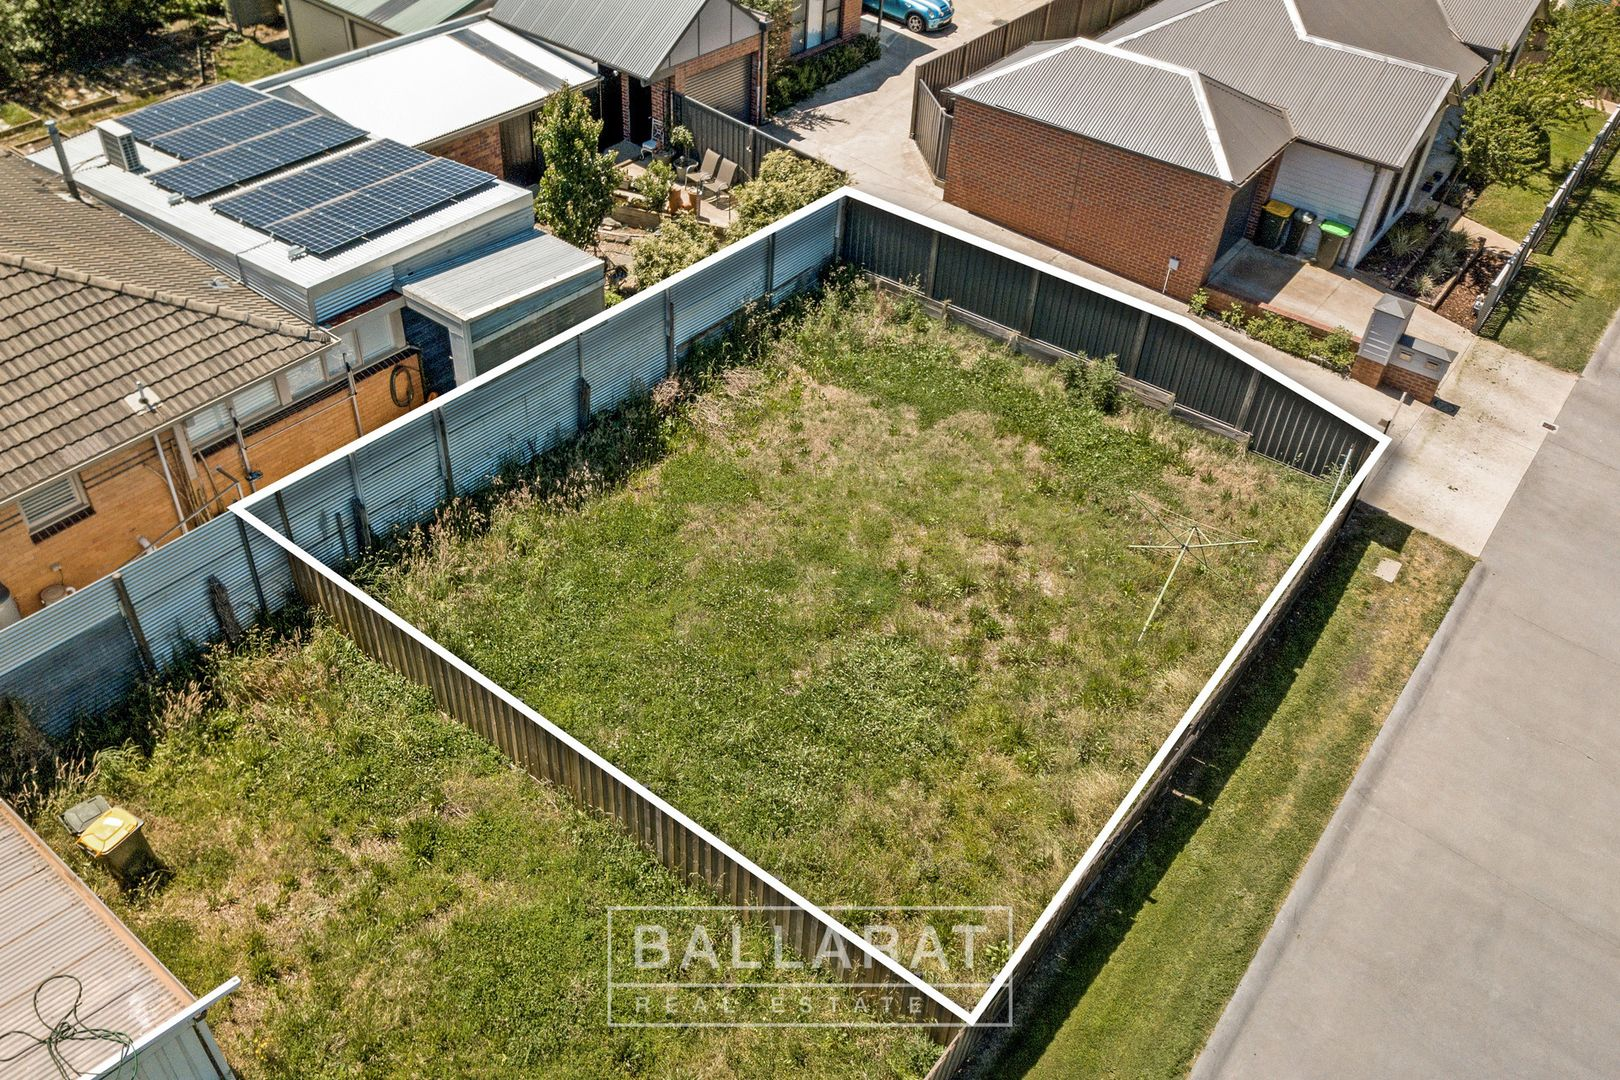 2/17 Queen Street South, Ballarat East VIC 3350, Image 0